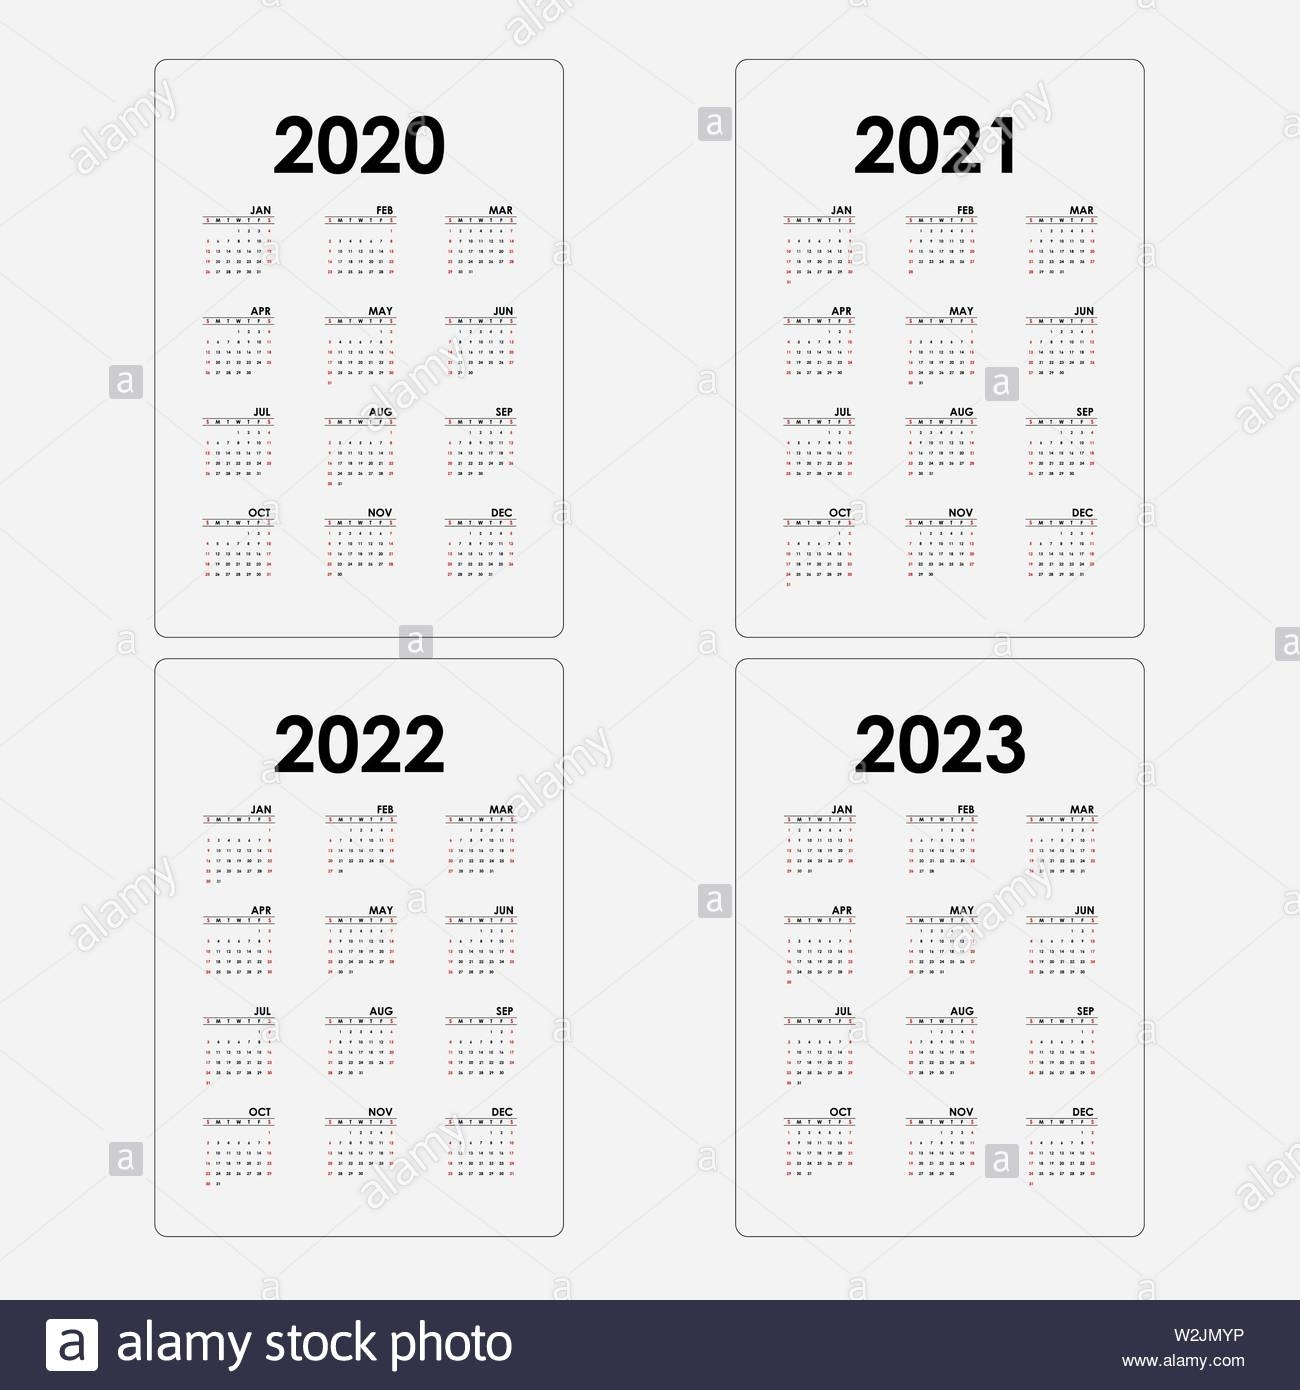 Calendar 2020, 2021,2022 And 2023 Calendar Template.yearly